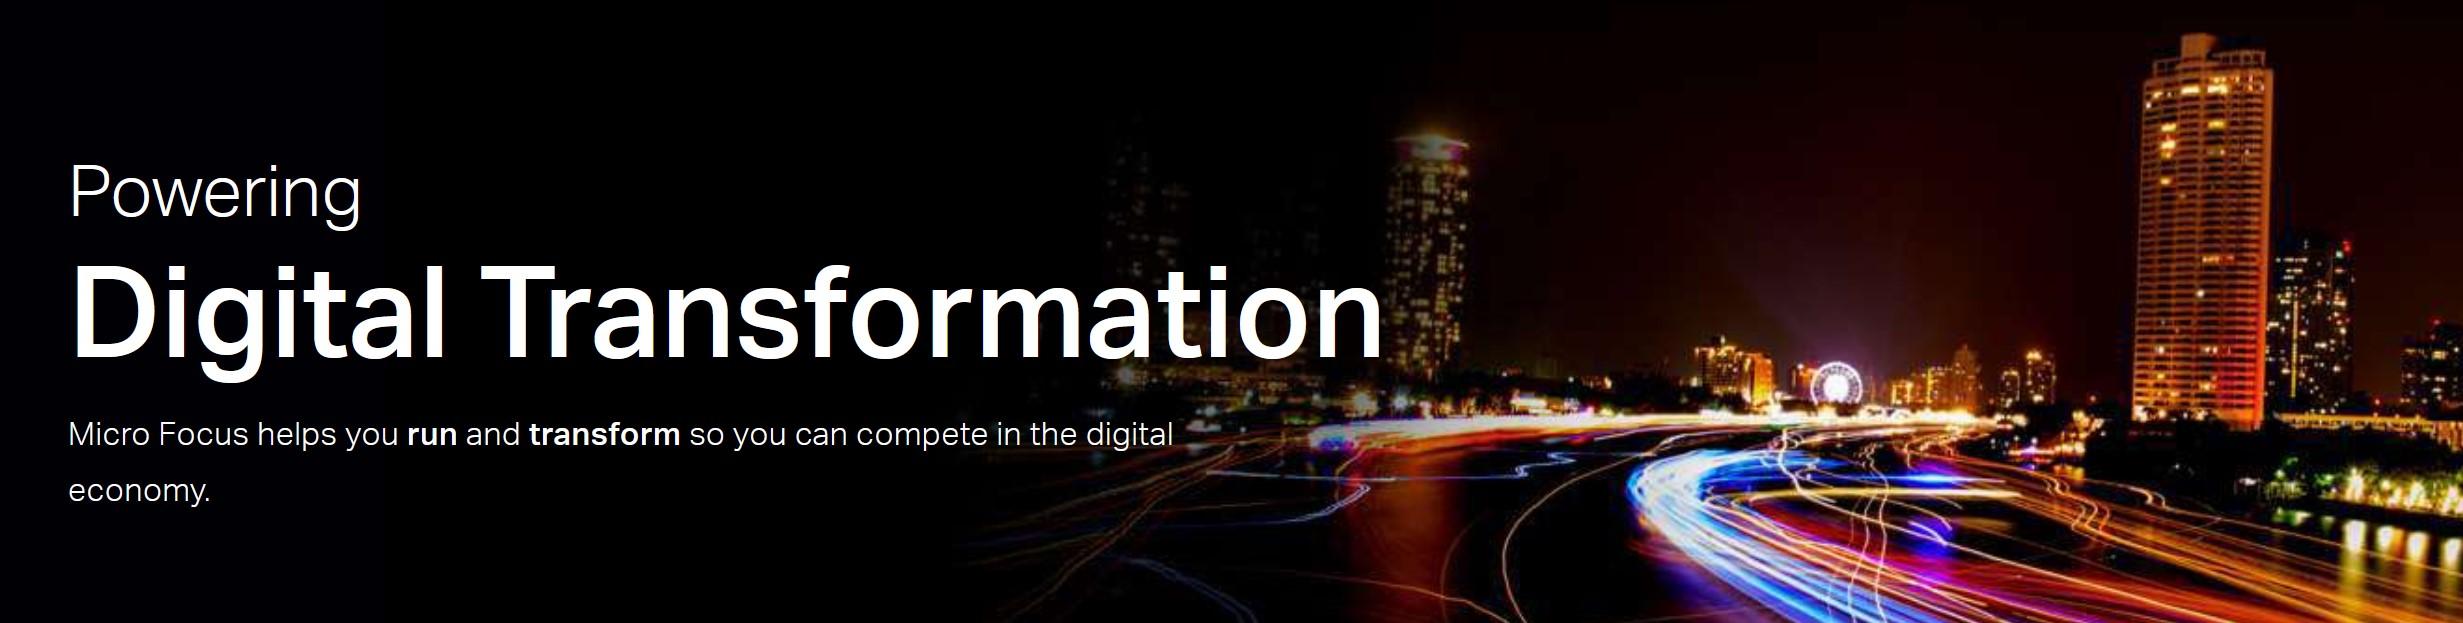 Powering digital transformation